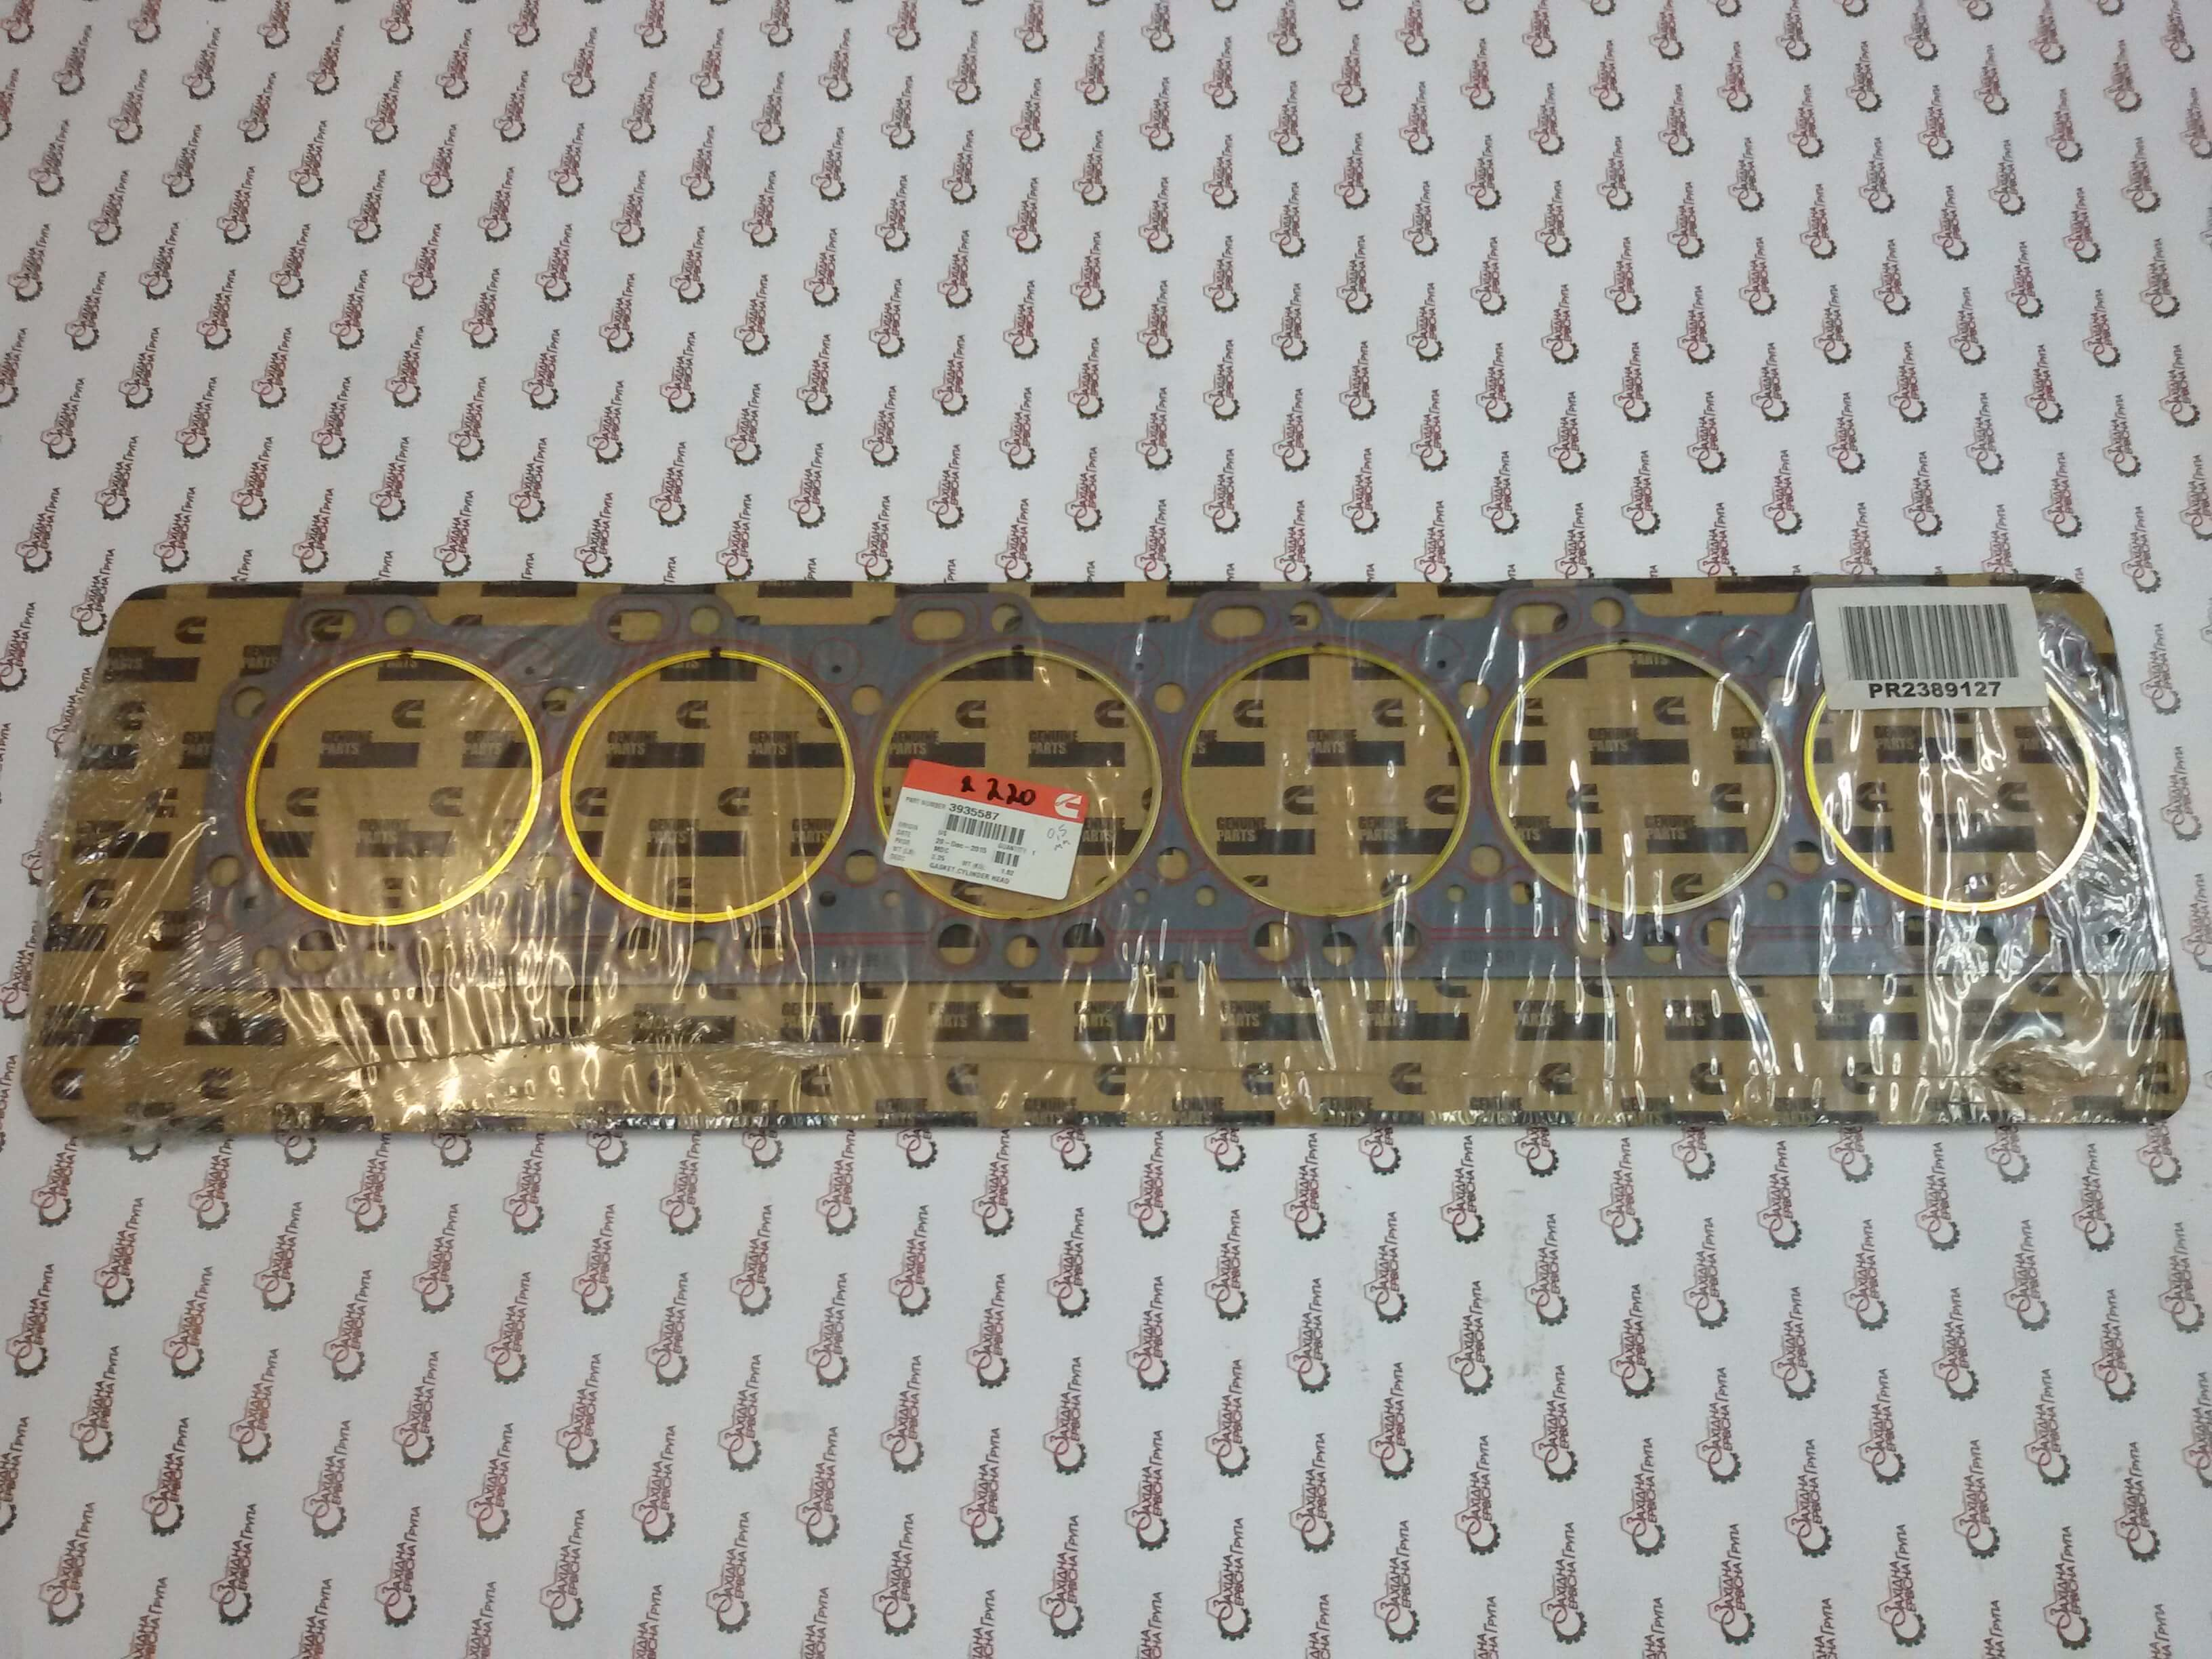 Прокладка ГБЦ (+0.50 мм) Cummins 6CT 8.3, 3935587, 3931027, 3928181, 3921853, 3914306.